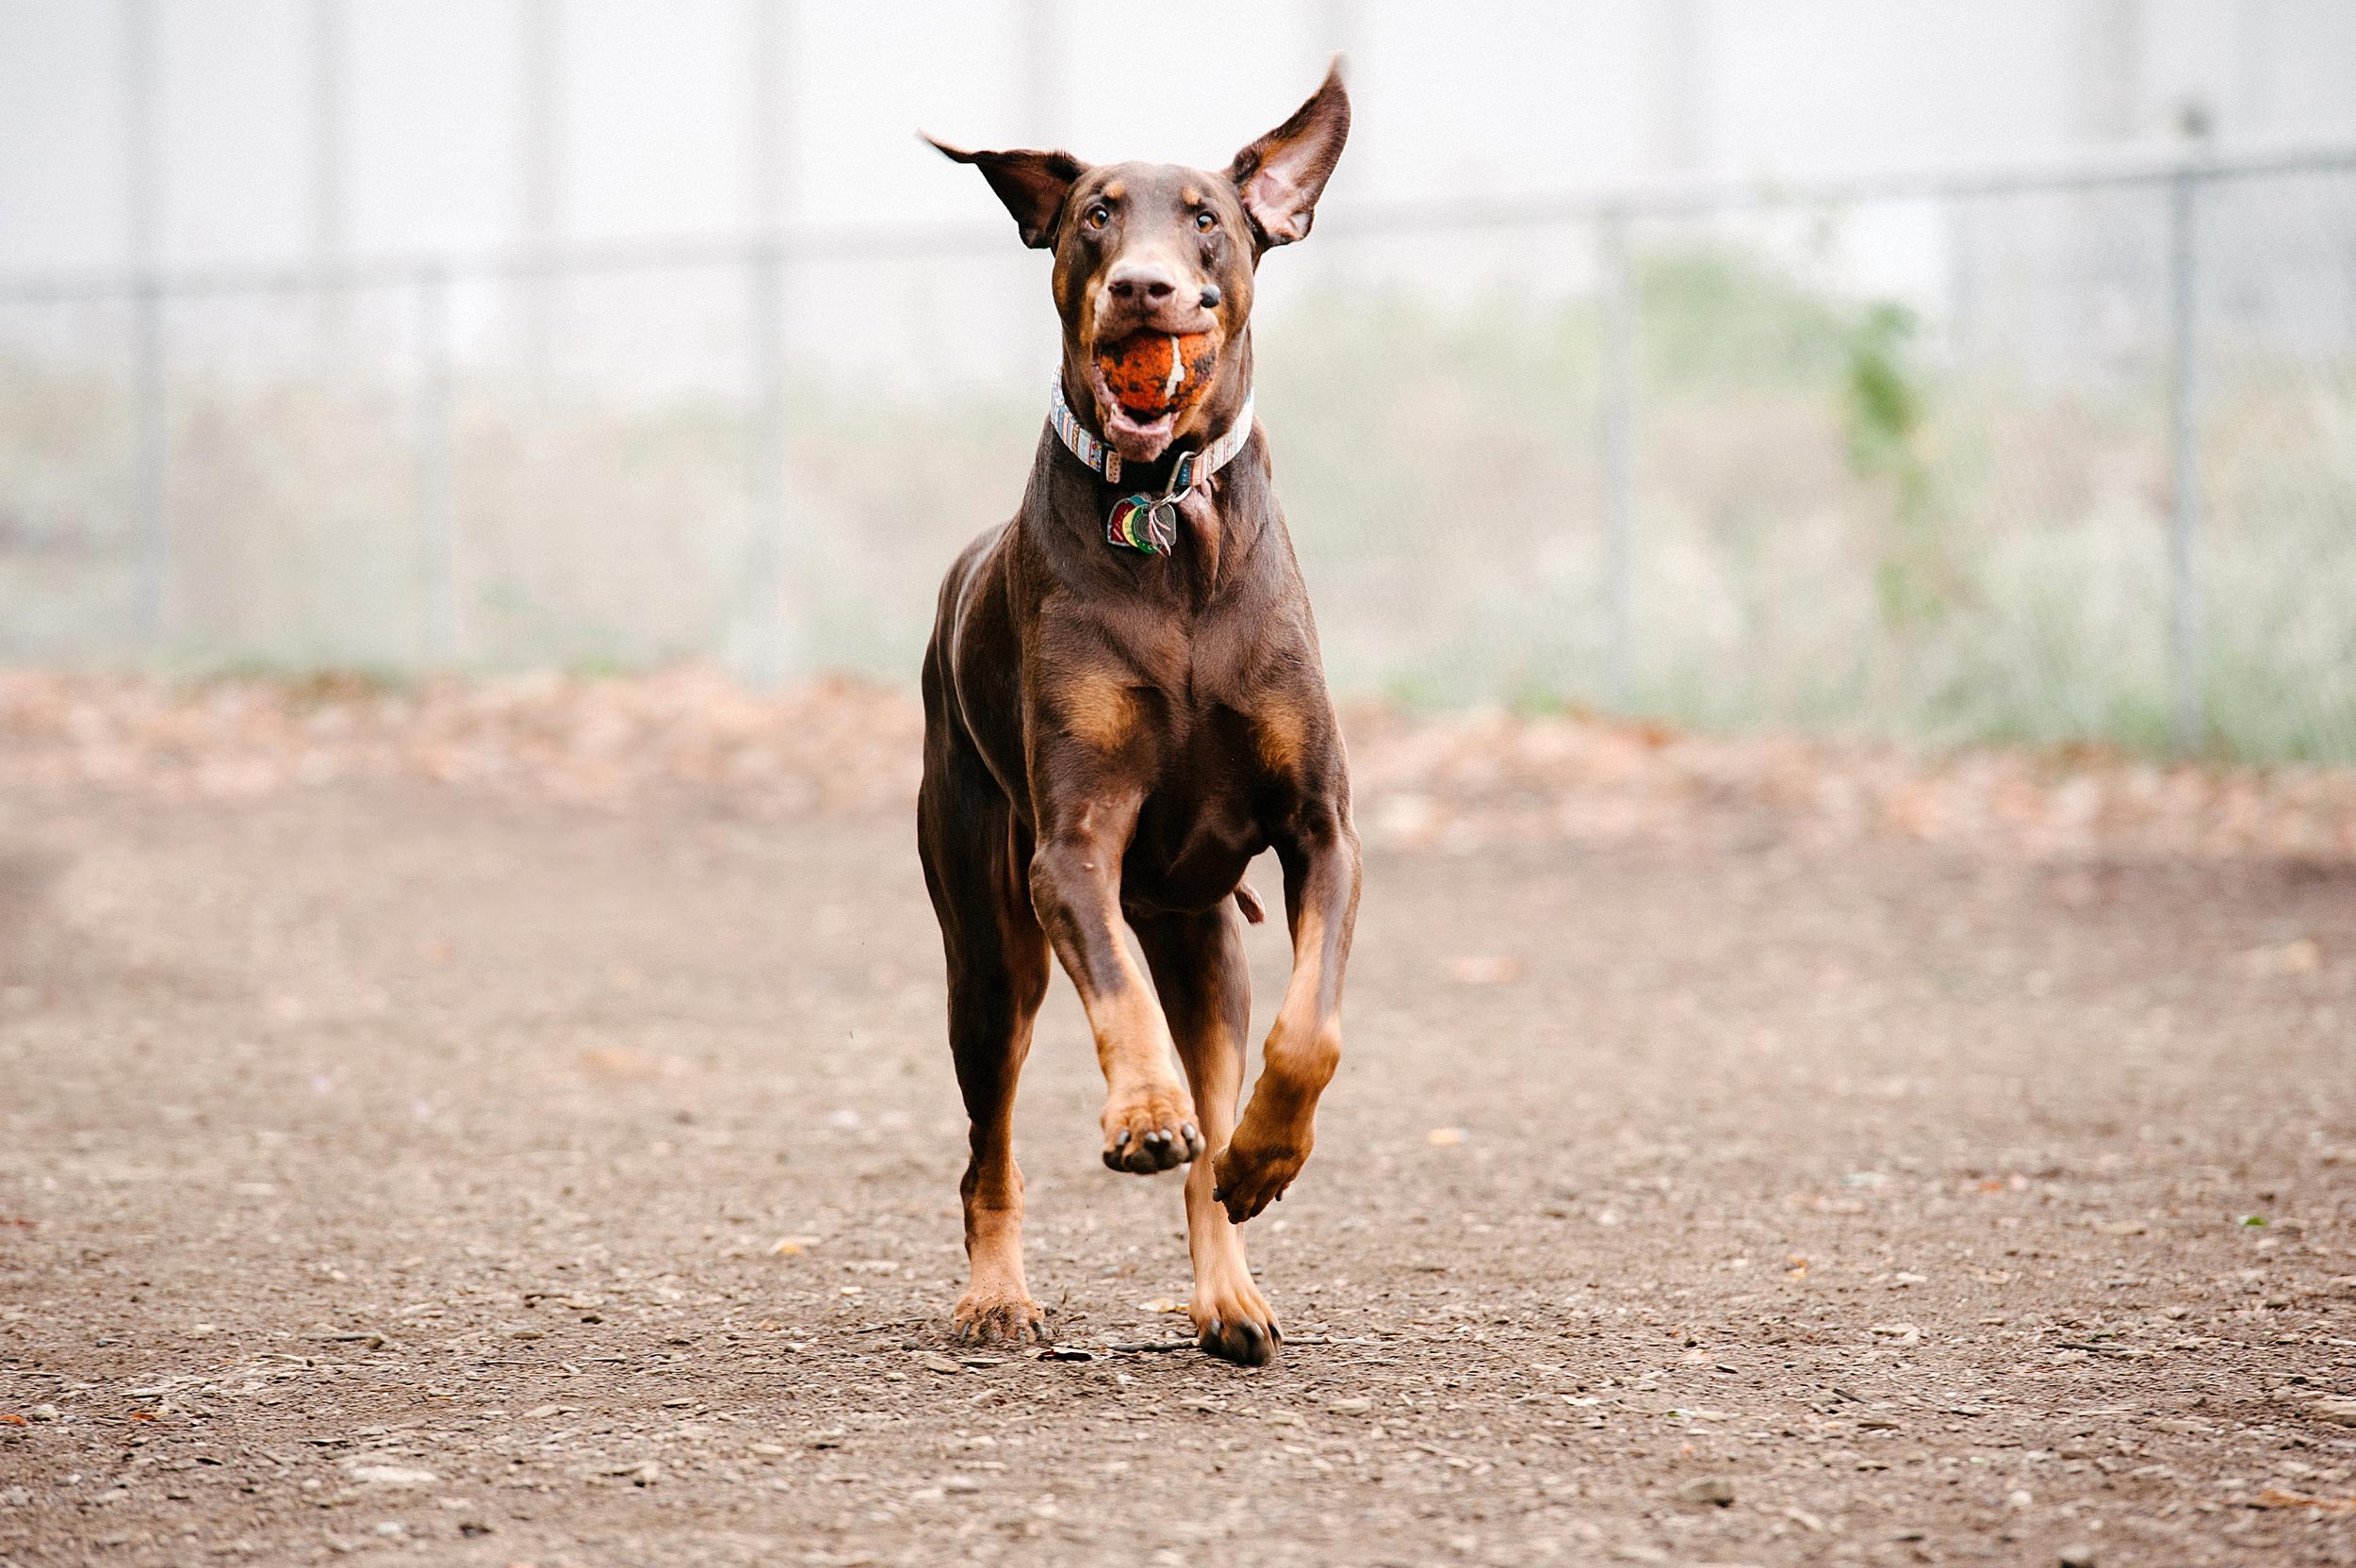 bernard-dog-run-pittsburgh-walsh08.jpg